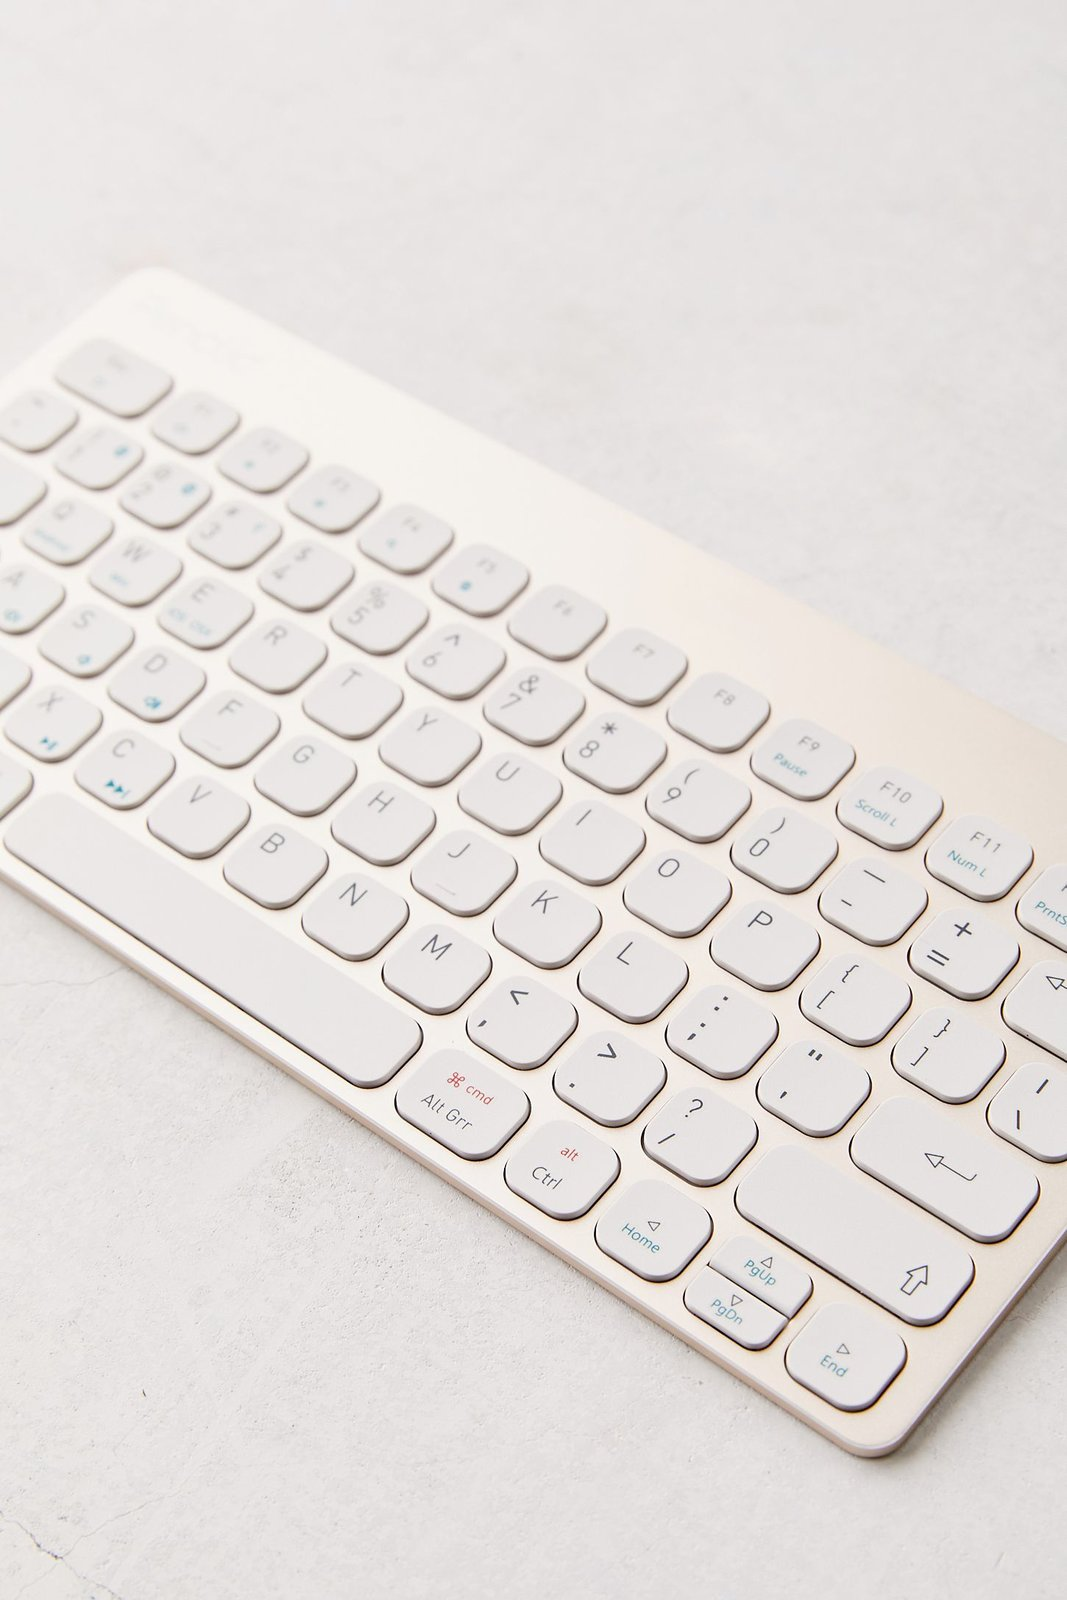 Penclic KB3 Mini Wireless Keyboard